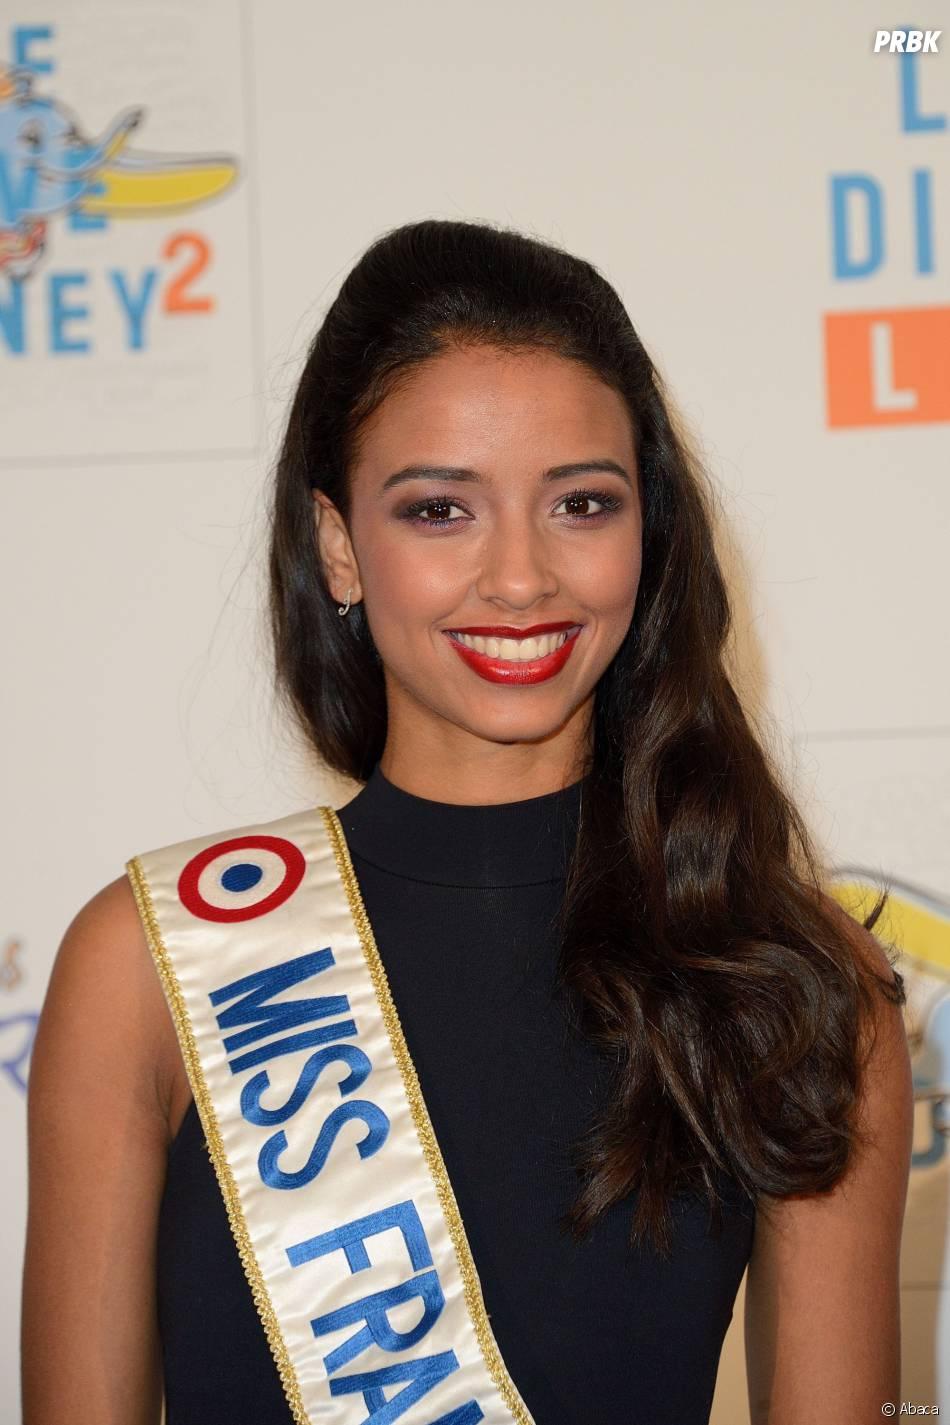 Flora Coquerel (Miss France 2014) mobilisée contre les attaques sanglantes de Boko Haram au Nigéria, au Cameroun, au Niger et au Tchad